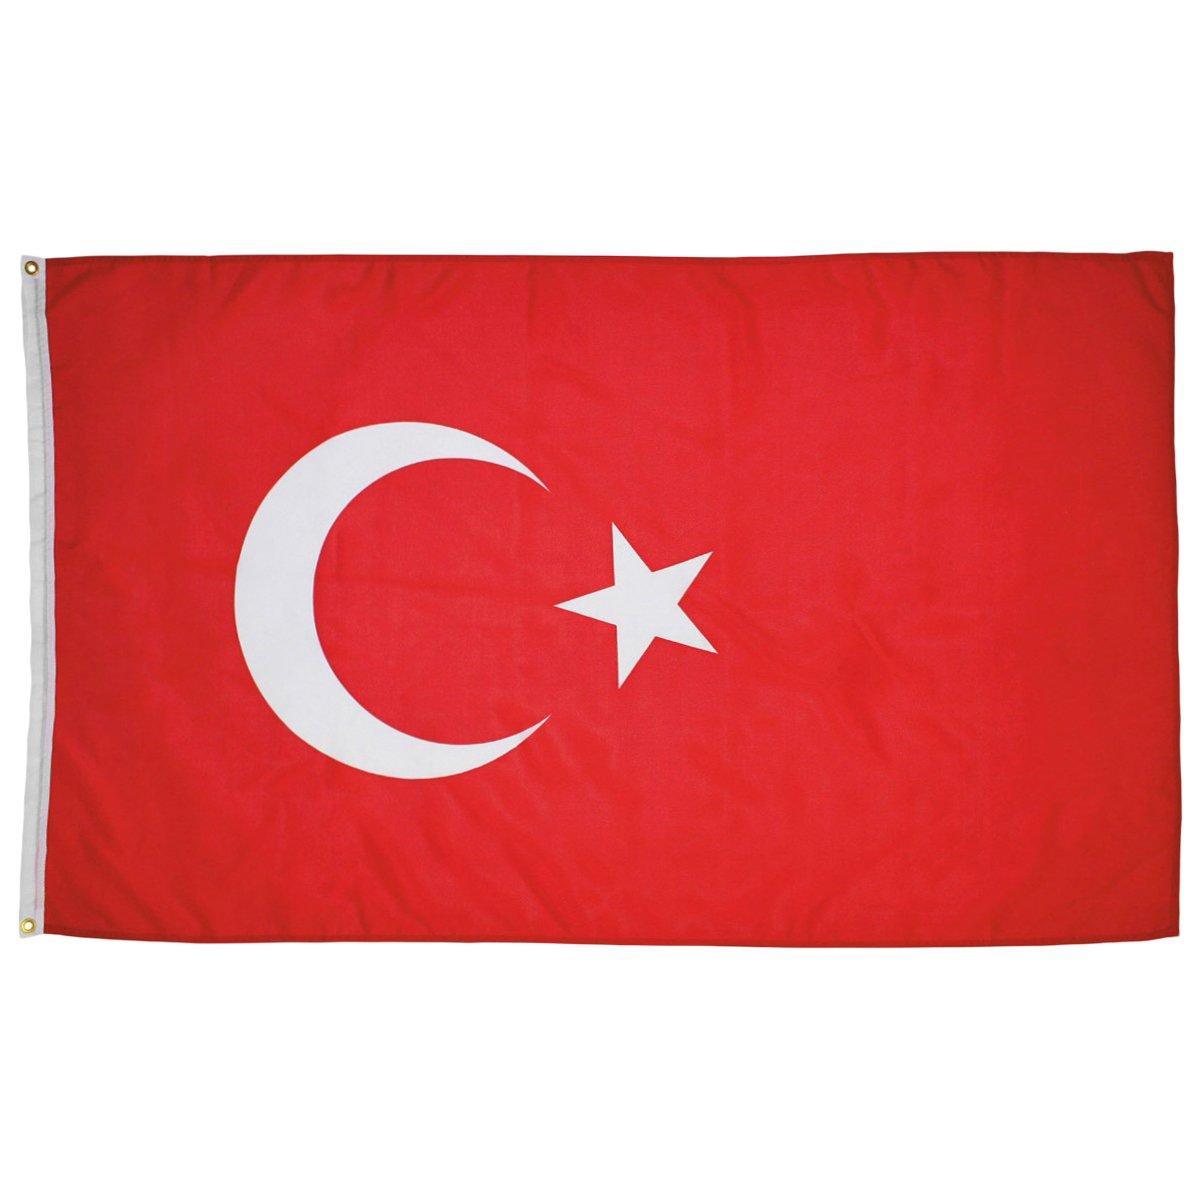 Mil-Tec Flagge Türkei 90x150cm